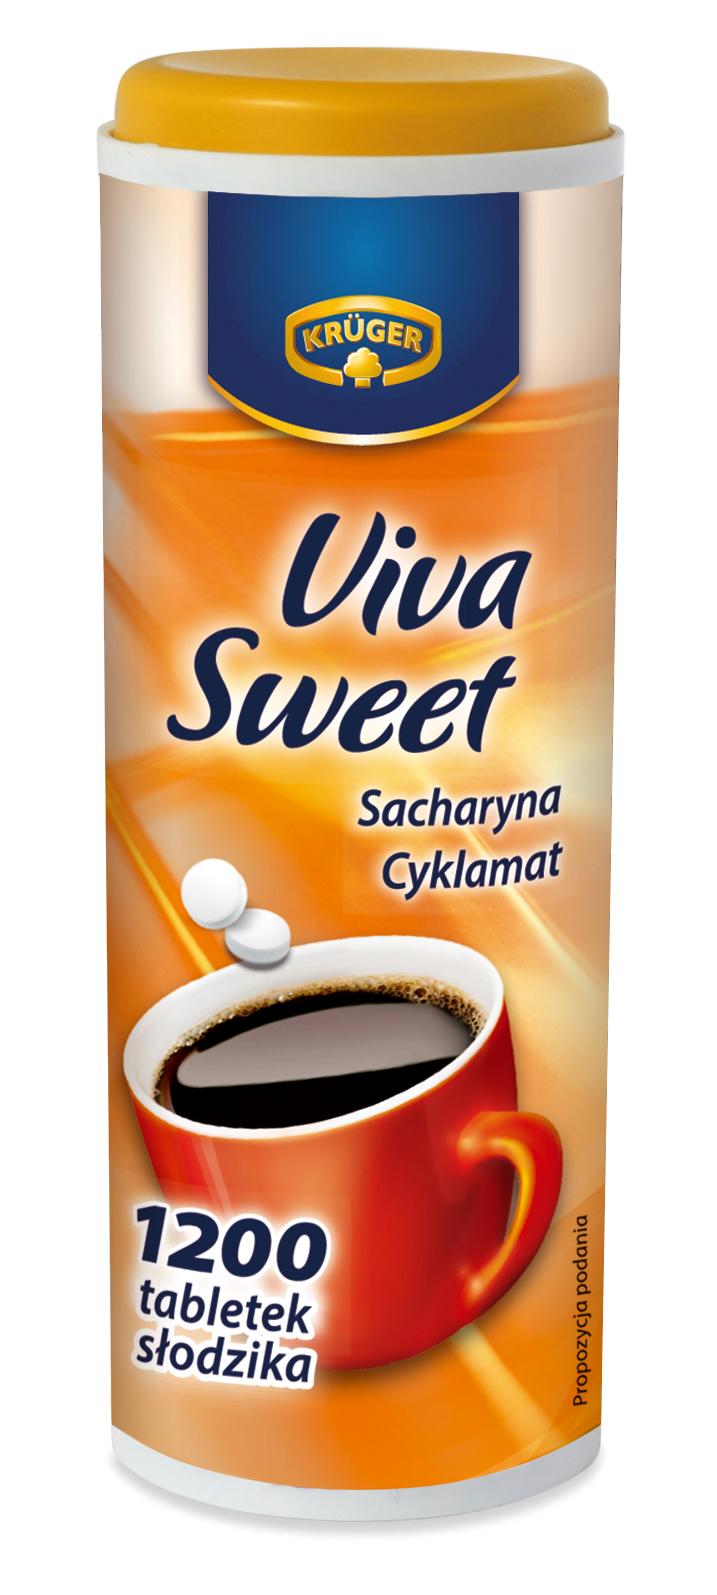 Krüger Słodzik Viva Sweet